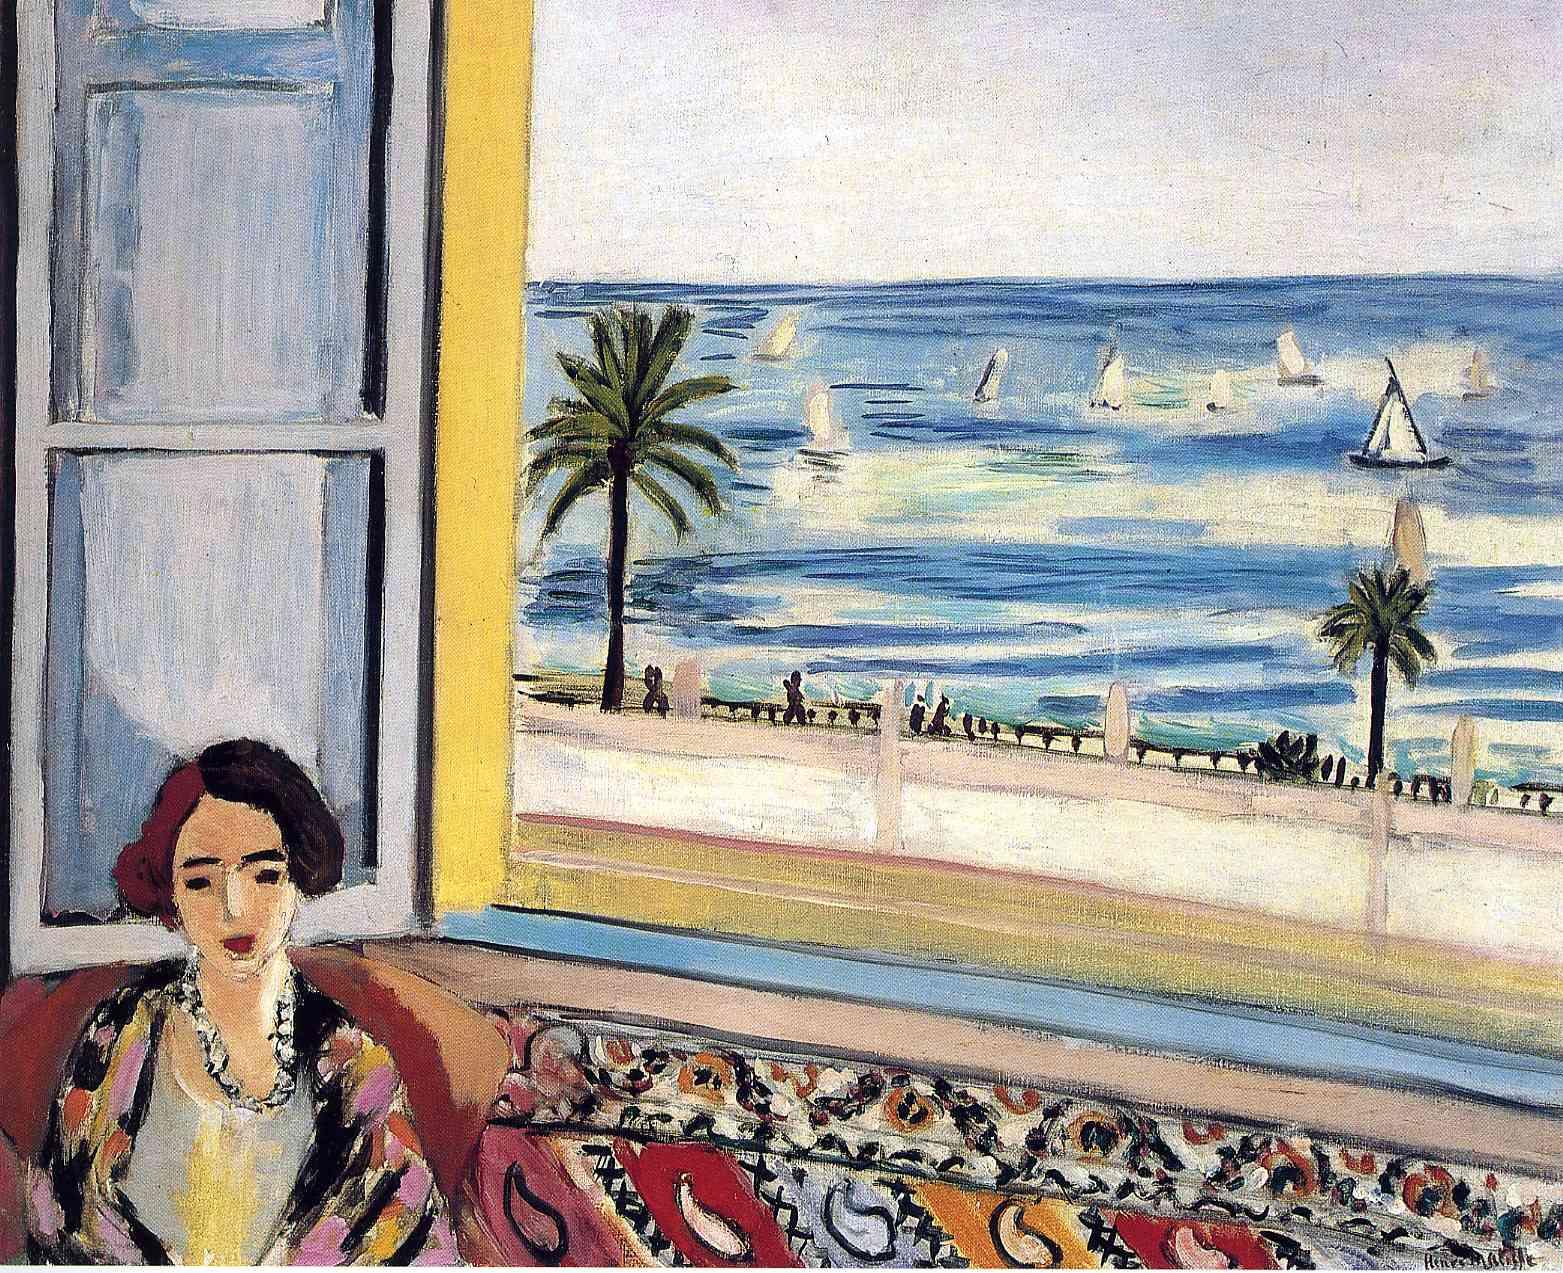 Open window matisse - Henri Matisse French Painter Art Matisse Com Picture